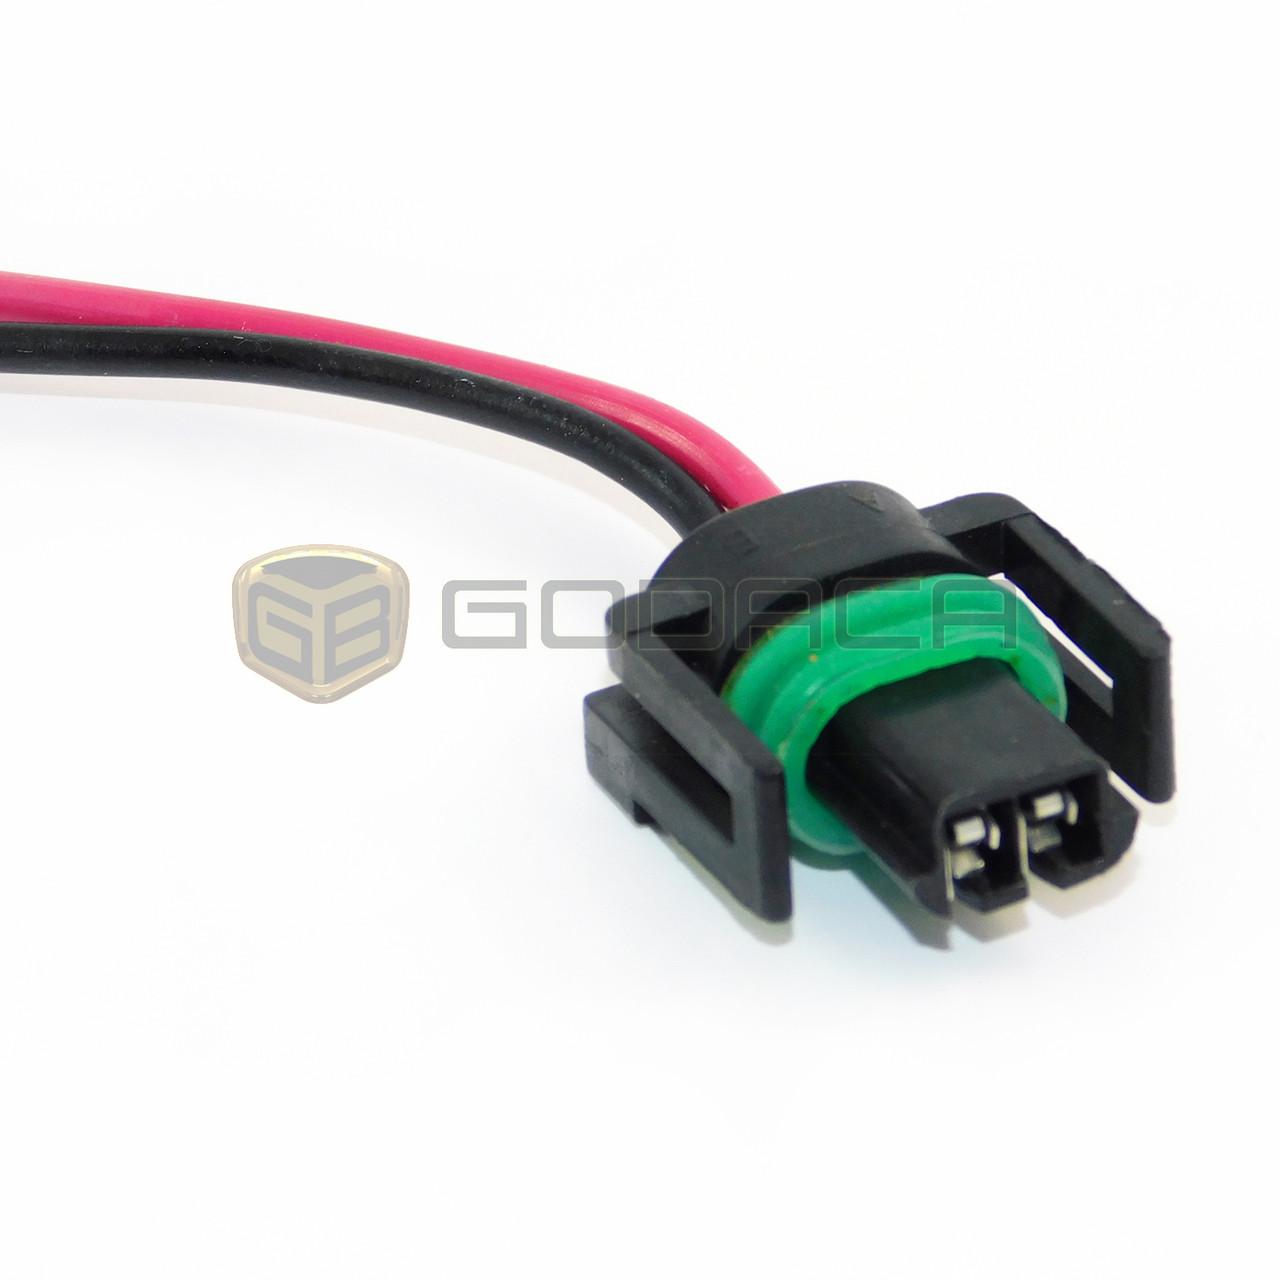 connector harness for pt118 gm 12085496 engine emission ignition throttle body godaca llc  [ 1280 x 1280 Pixel ]